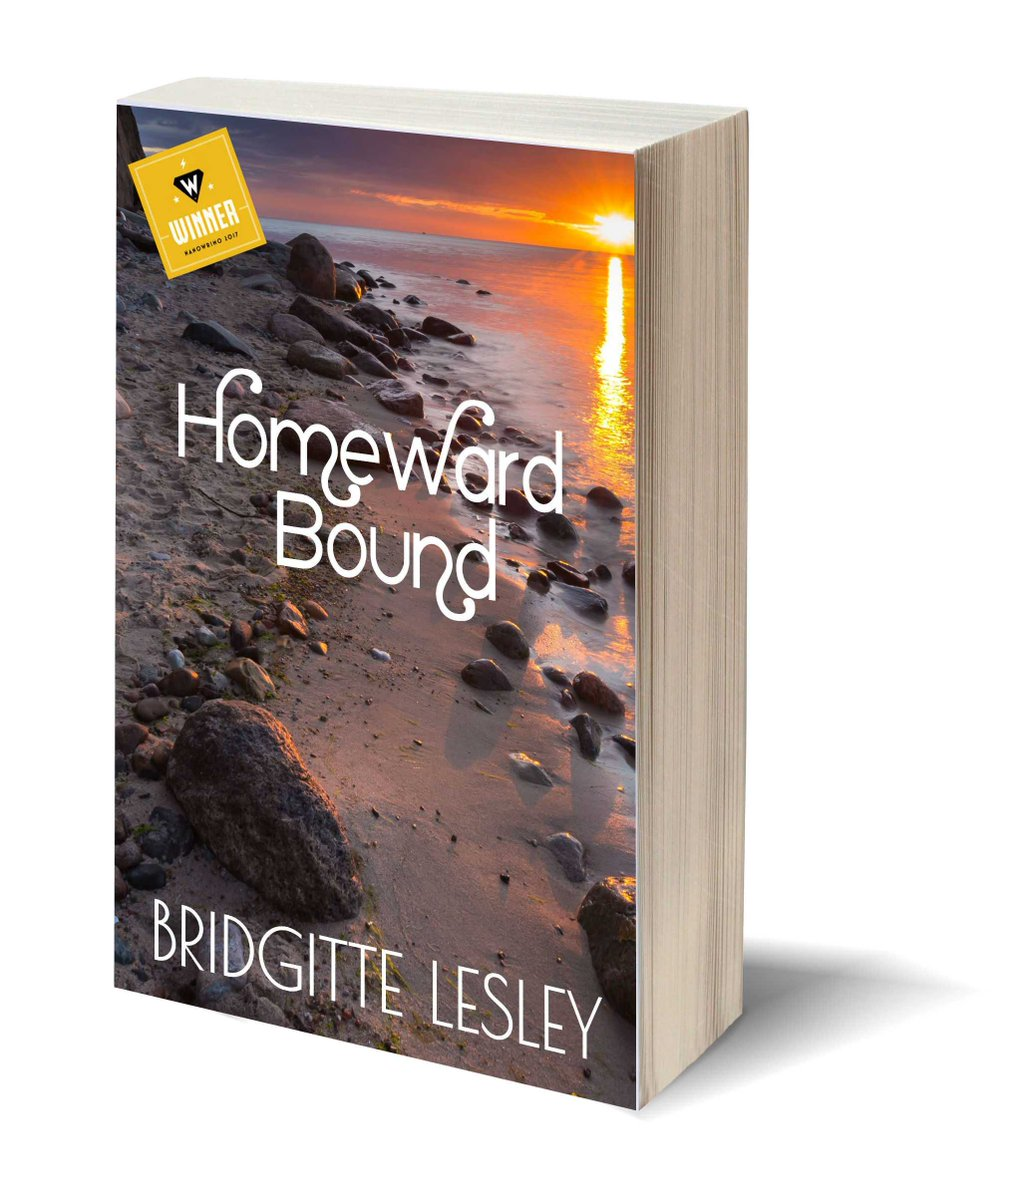 "Curiosity got the better of him! ★HOMEWARD BOUND★ - - - Smashwords http://bit.ly/2FWXFUL Lulu http://bit.ly/2D4j6SX  pic.twitter.com/nS2TYVbPXR #ASMSG #authorRT ""@BridgitteLesley http://bridgittelesley.wordpress.com/"